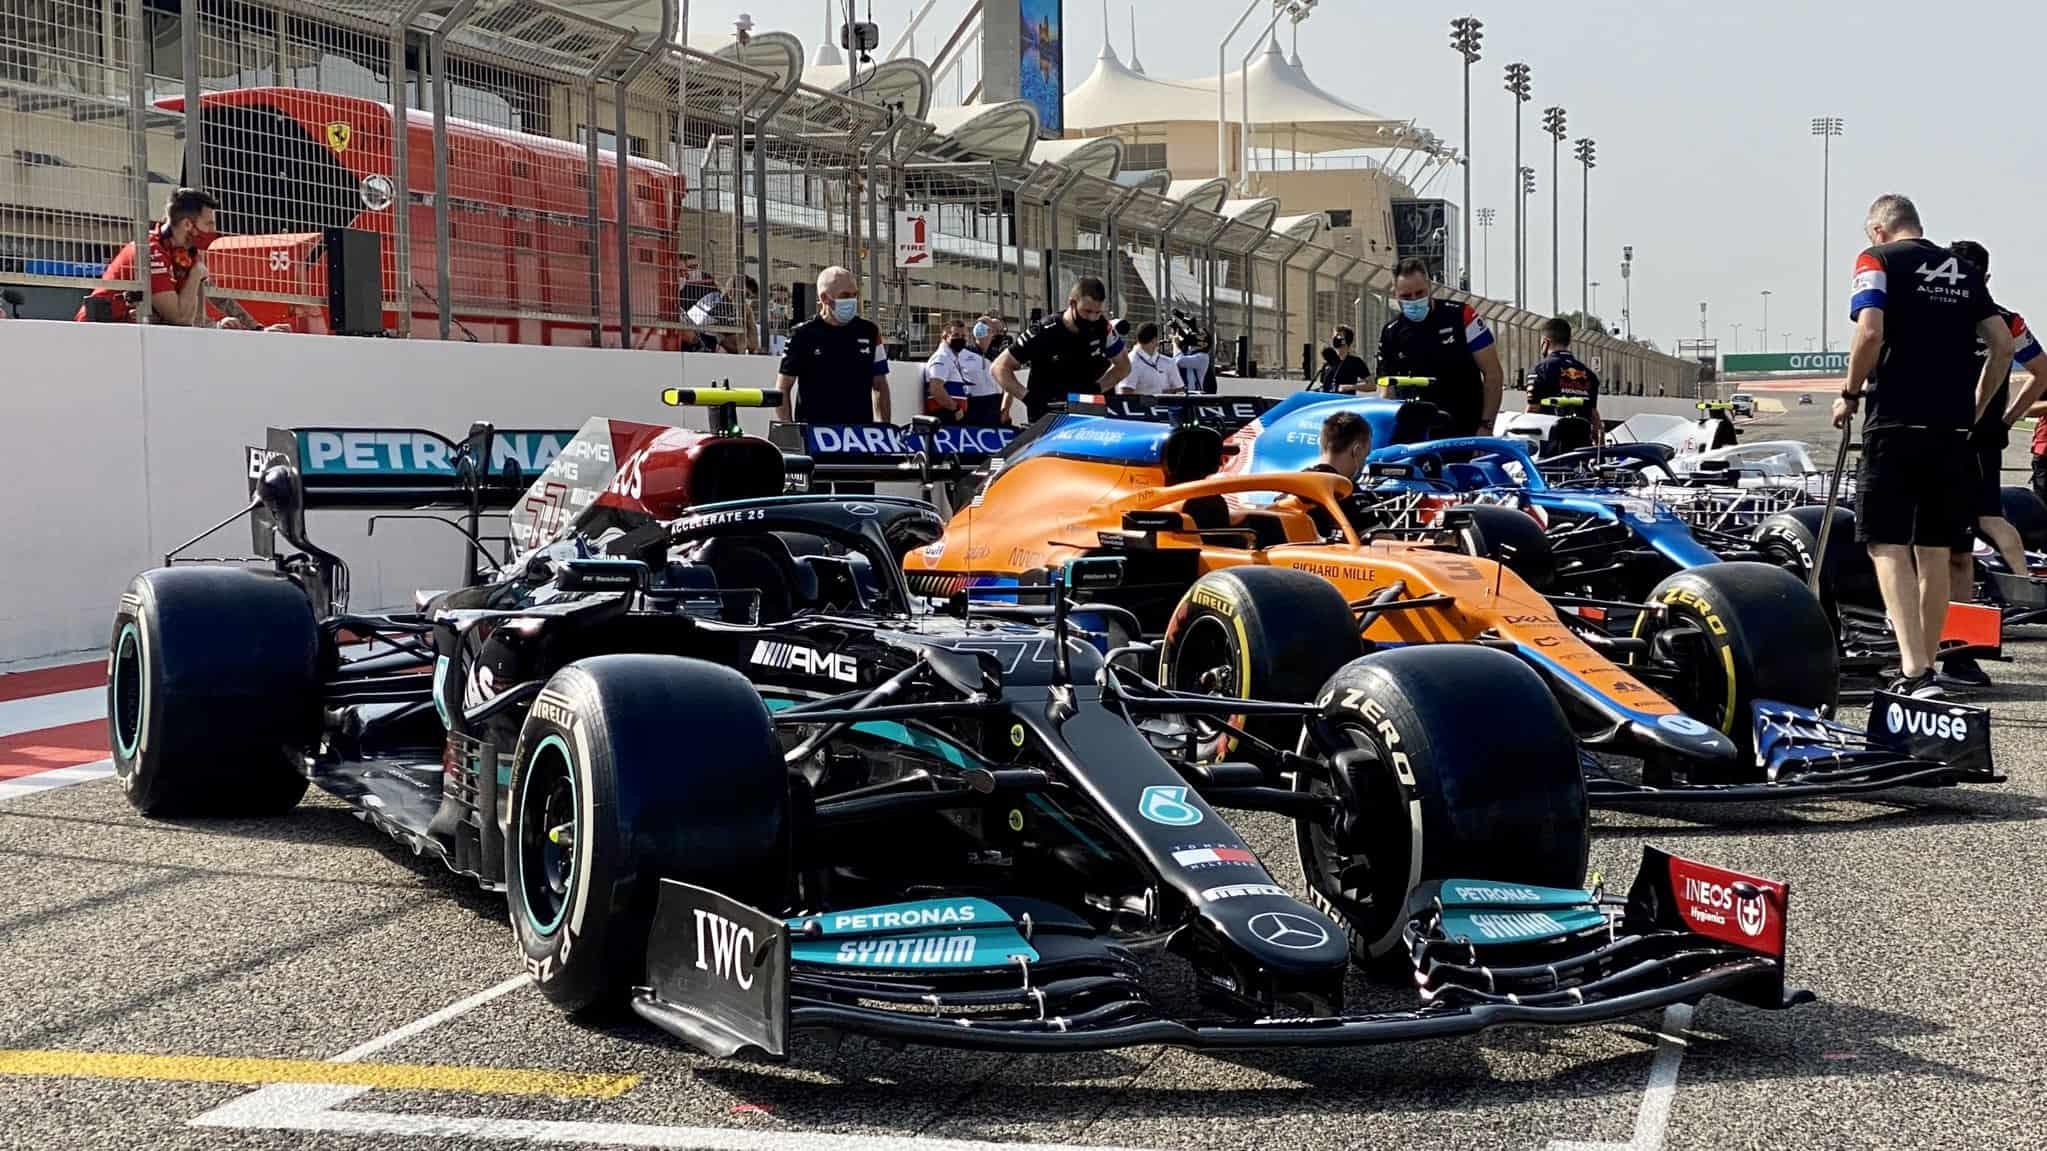 2021 Mercedes F1 W12 Bahrain testing pitlane Photo Mercedes AMG Petronas Twitter